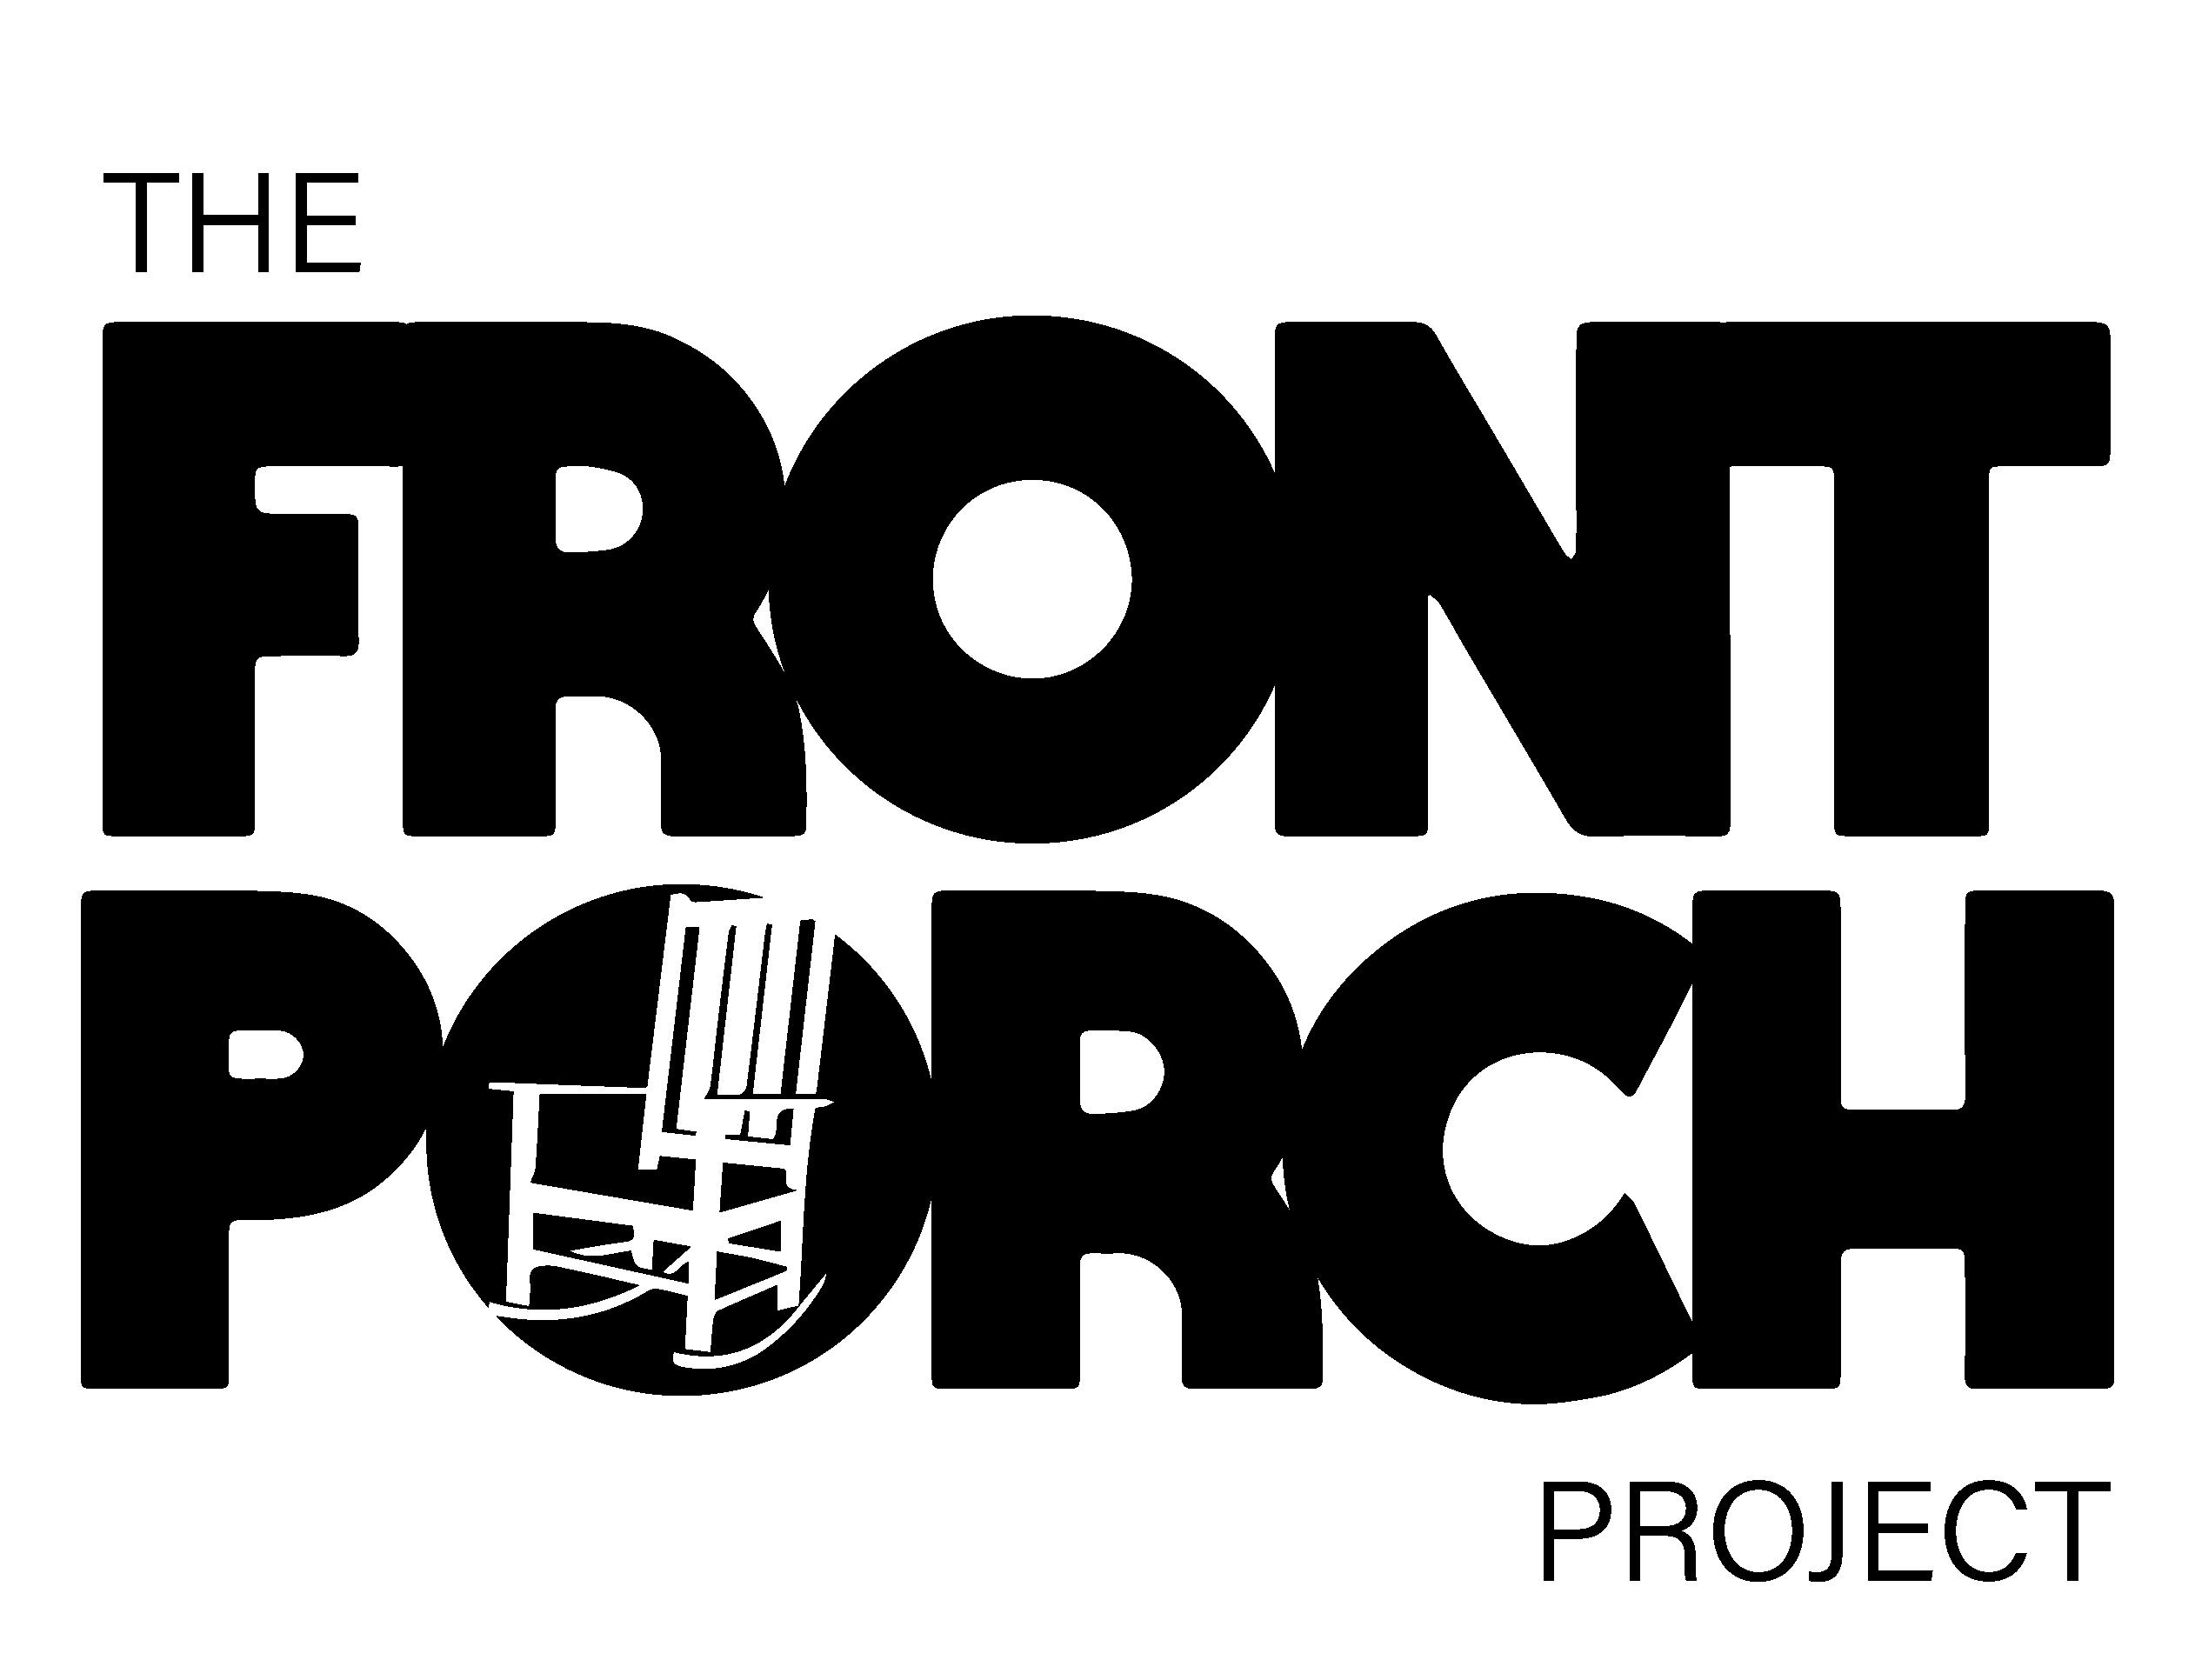 Frontporchlogo-Black